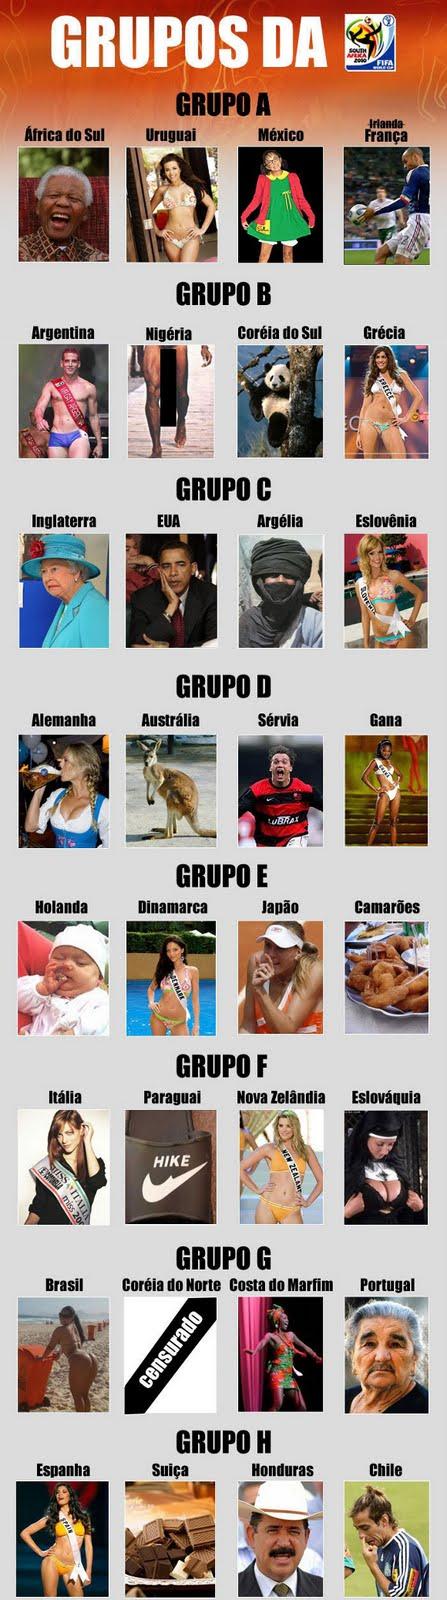 http://4.bp.blogspot.com/_r4HrqKguZmY/TBkMjK5MN-I/AAAAAAAABIs/irTgEkj-0ow/s1600/Grupos+da+Copa+2010.jpg